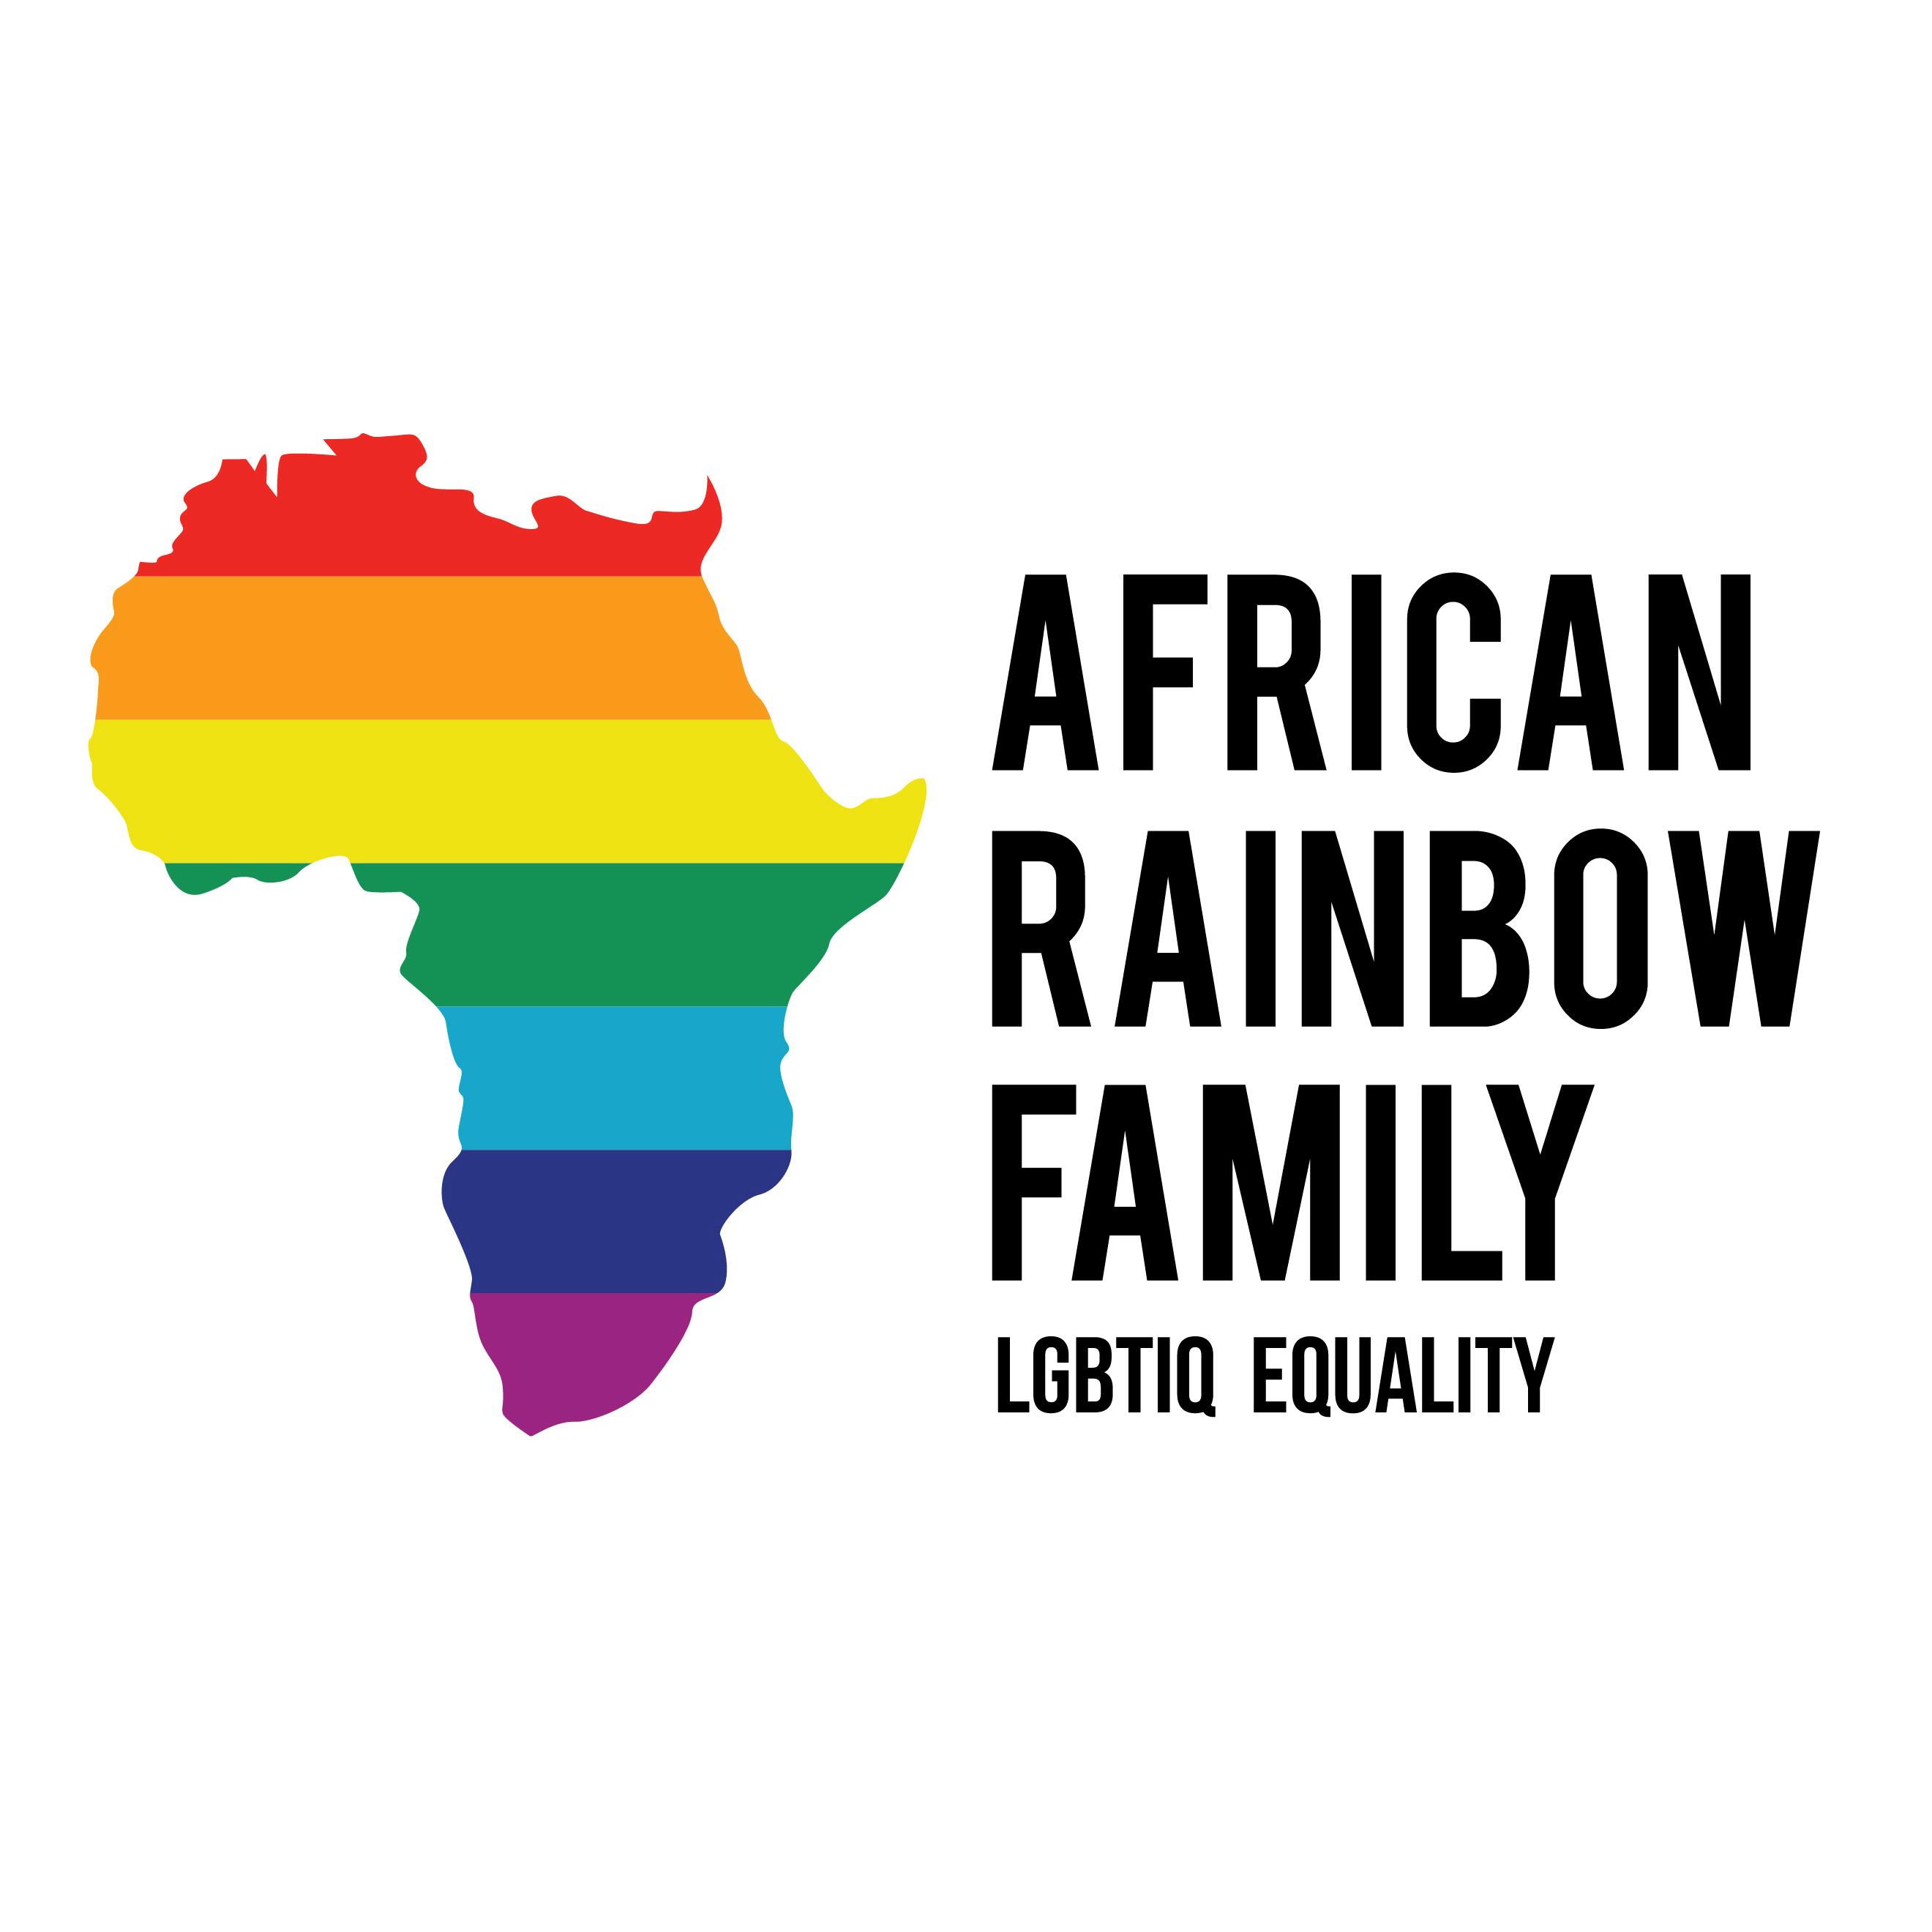 African Rainbow Family logo